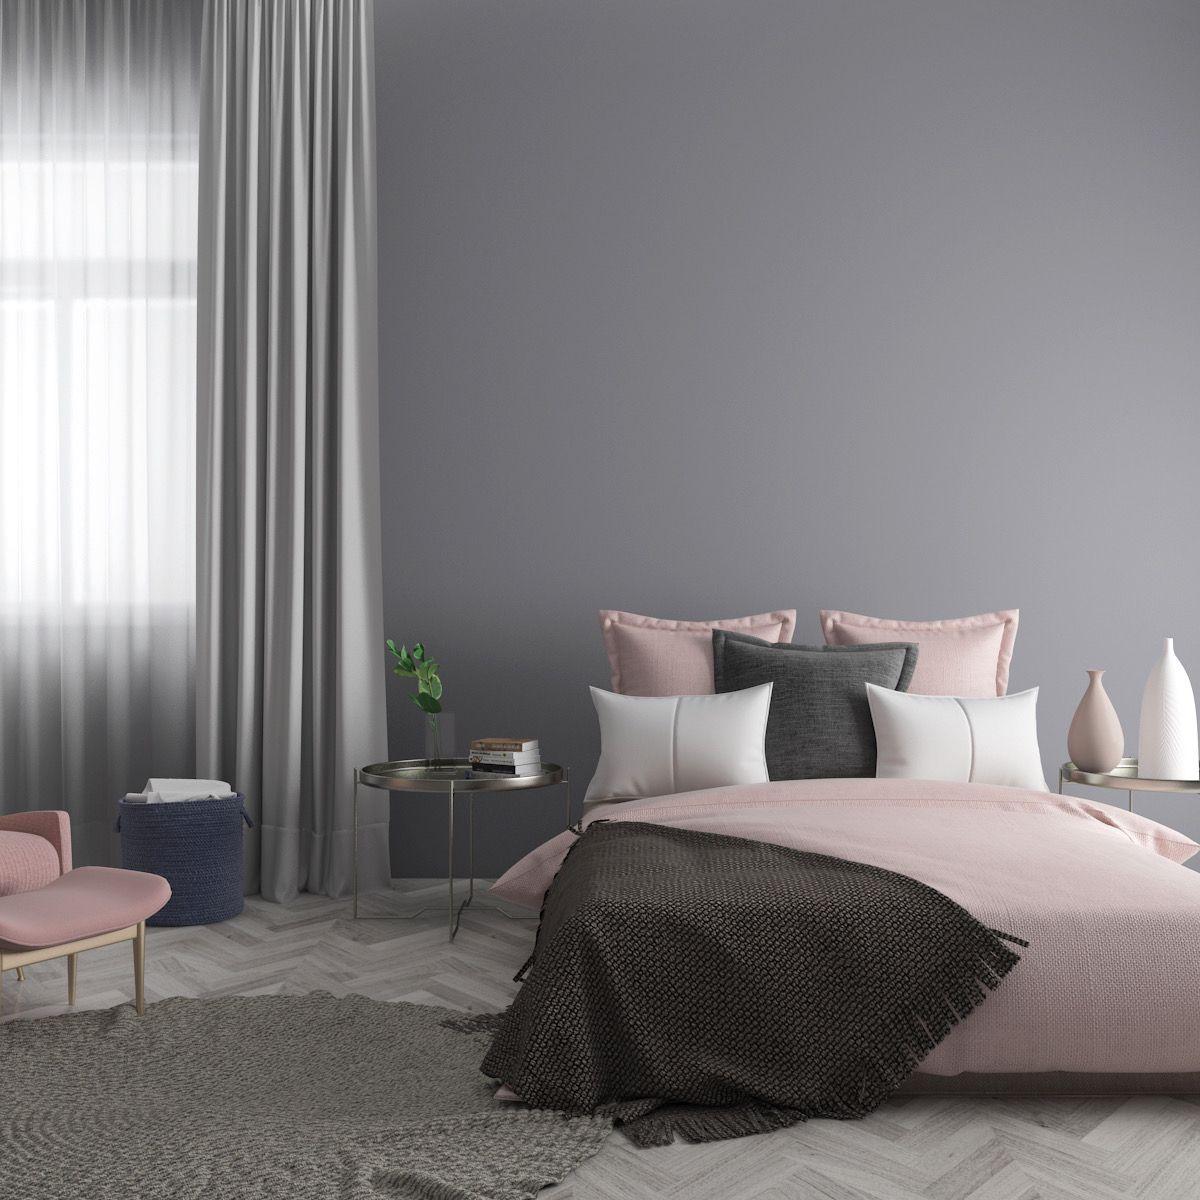 ظل القمر June Colors Home Decor Furniture